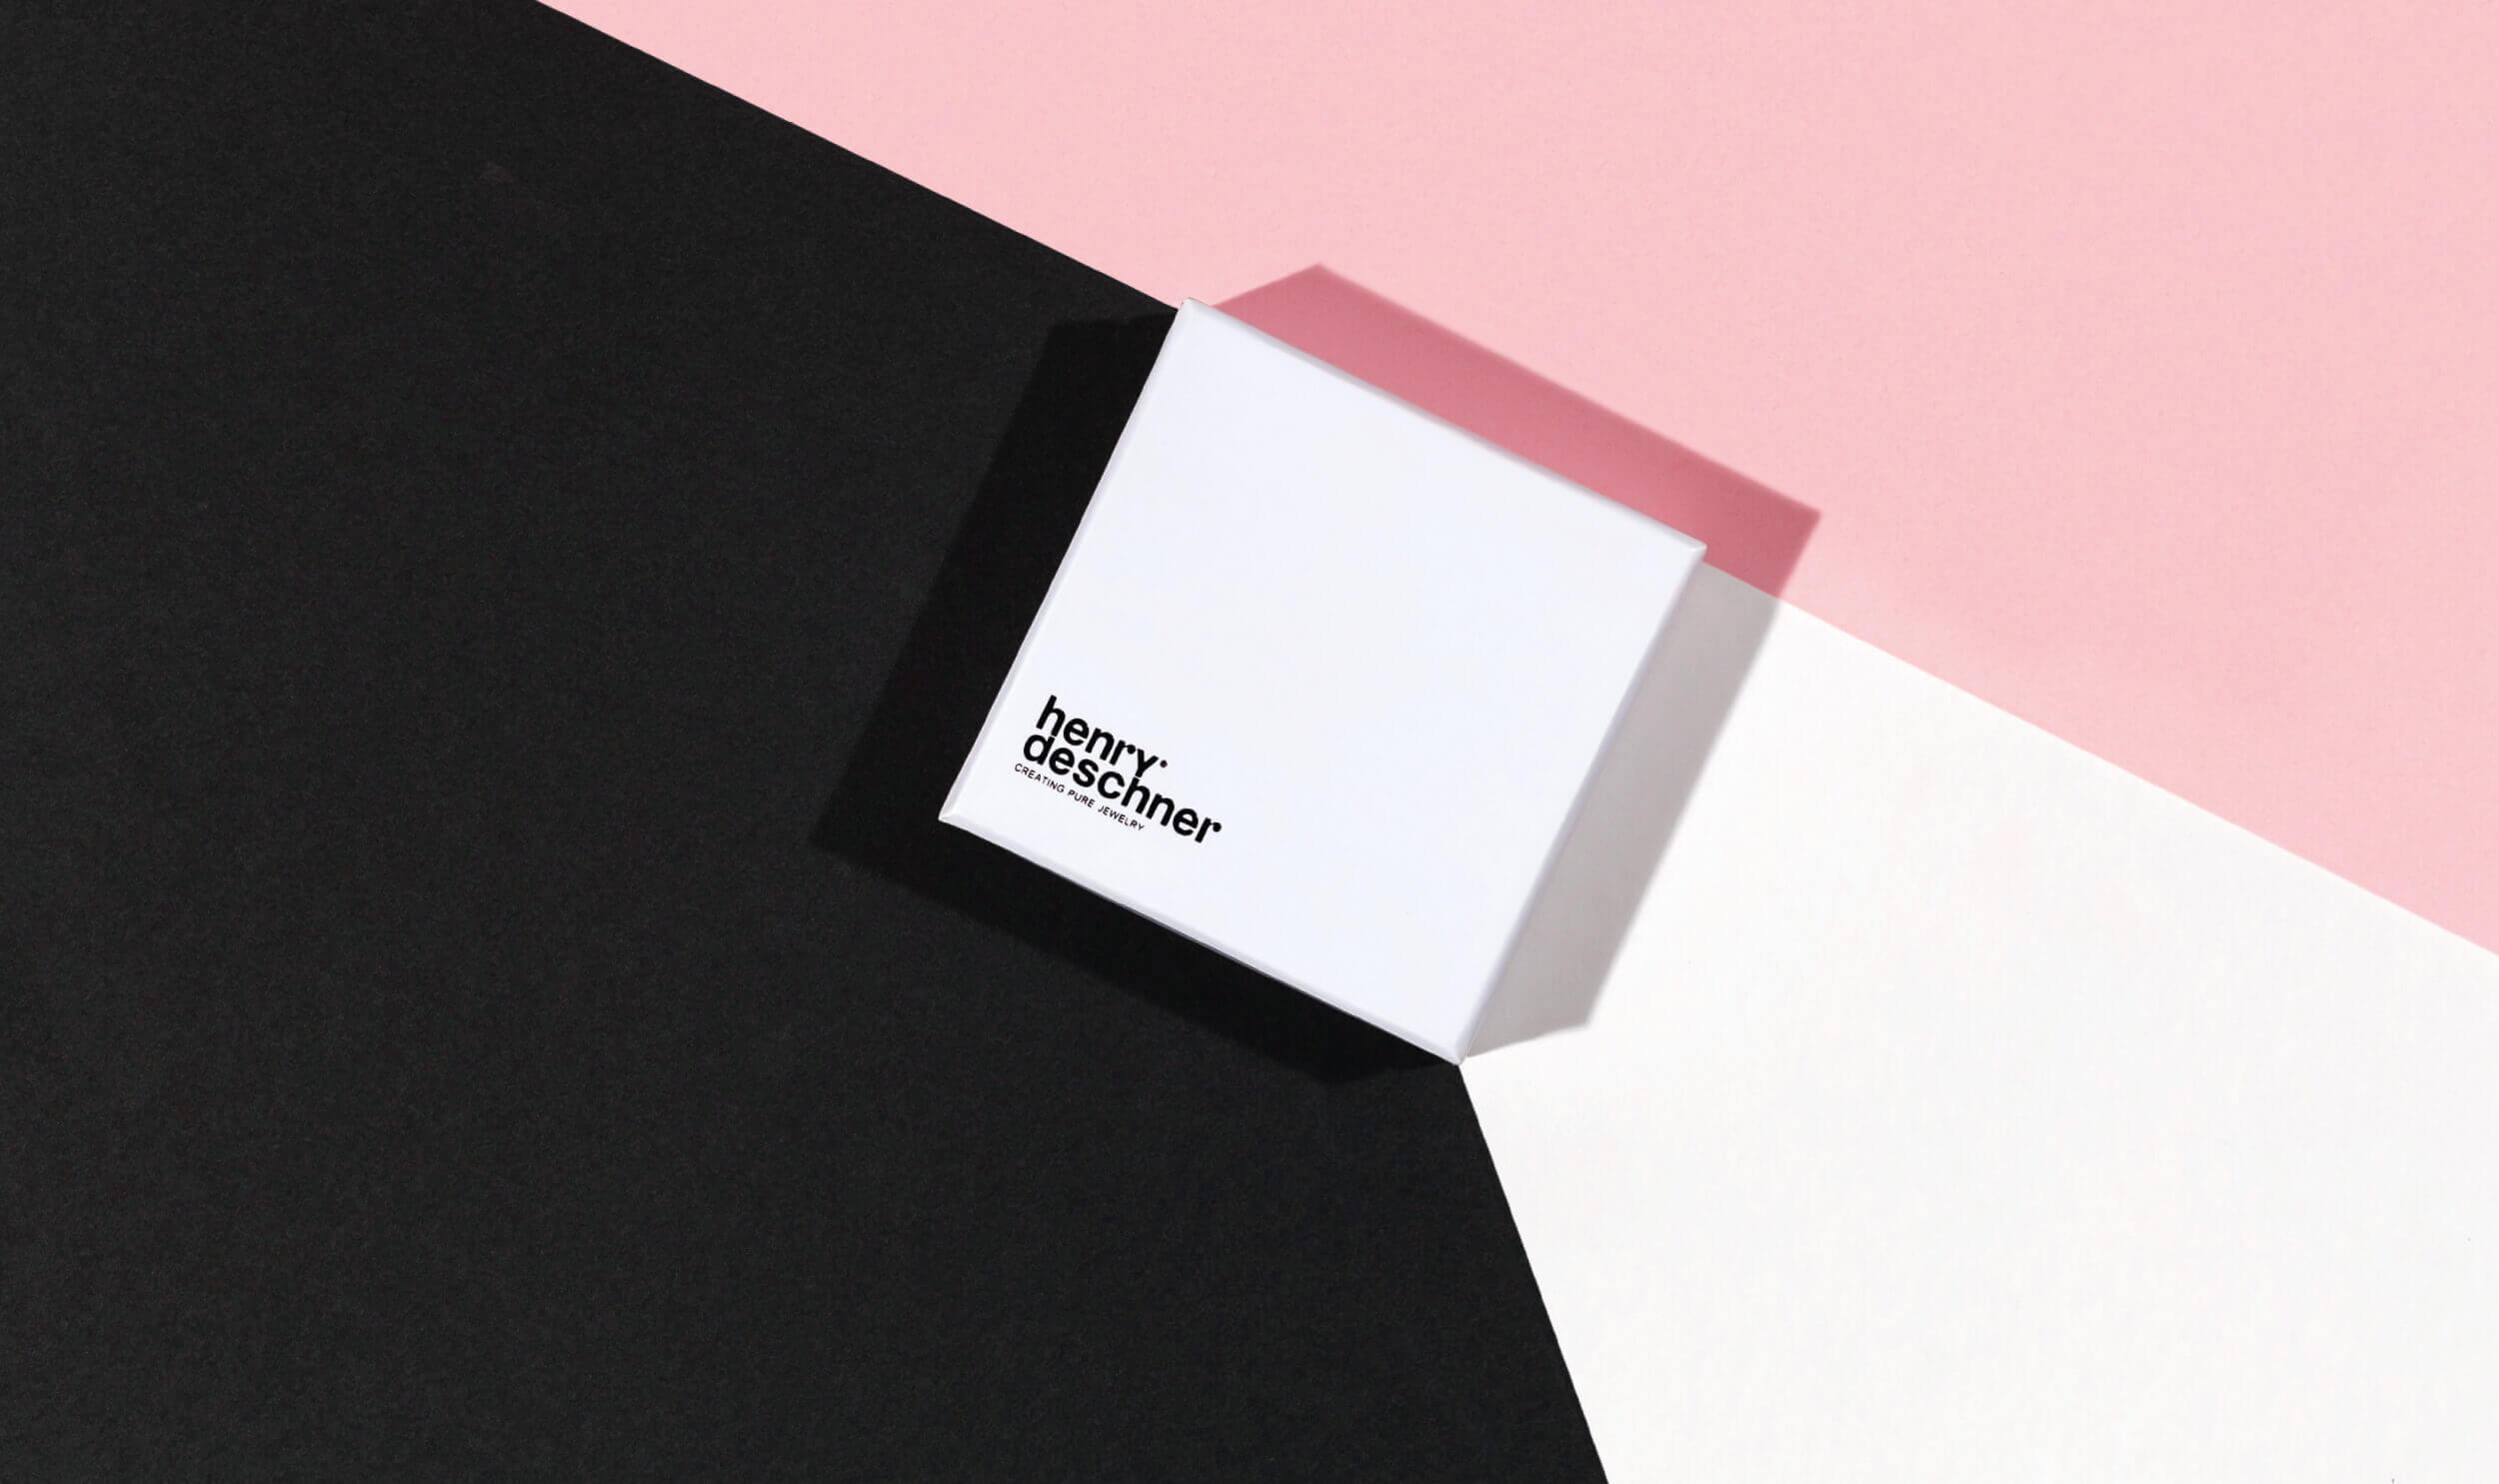 cyclos deschner henry logo packaging